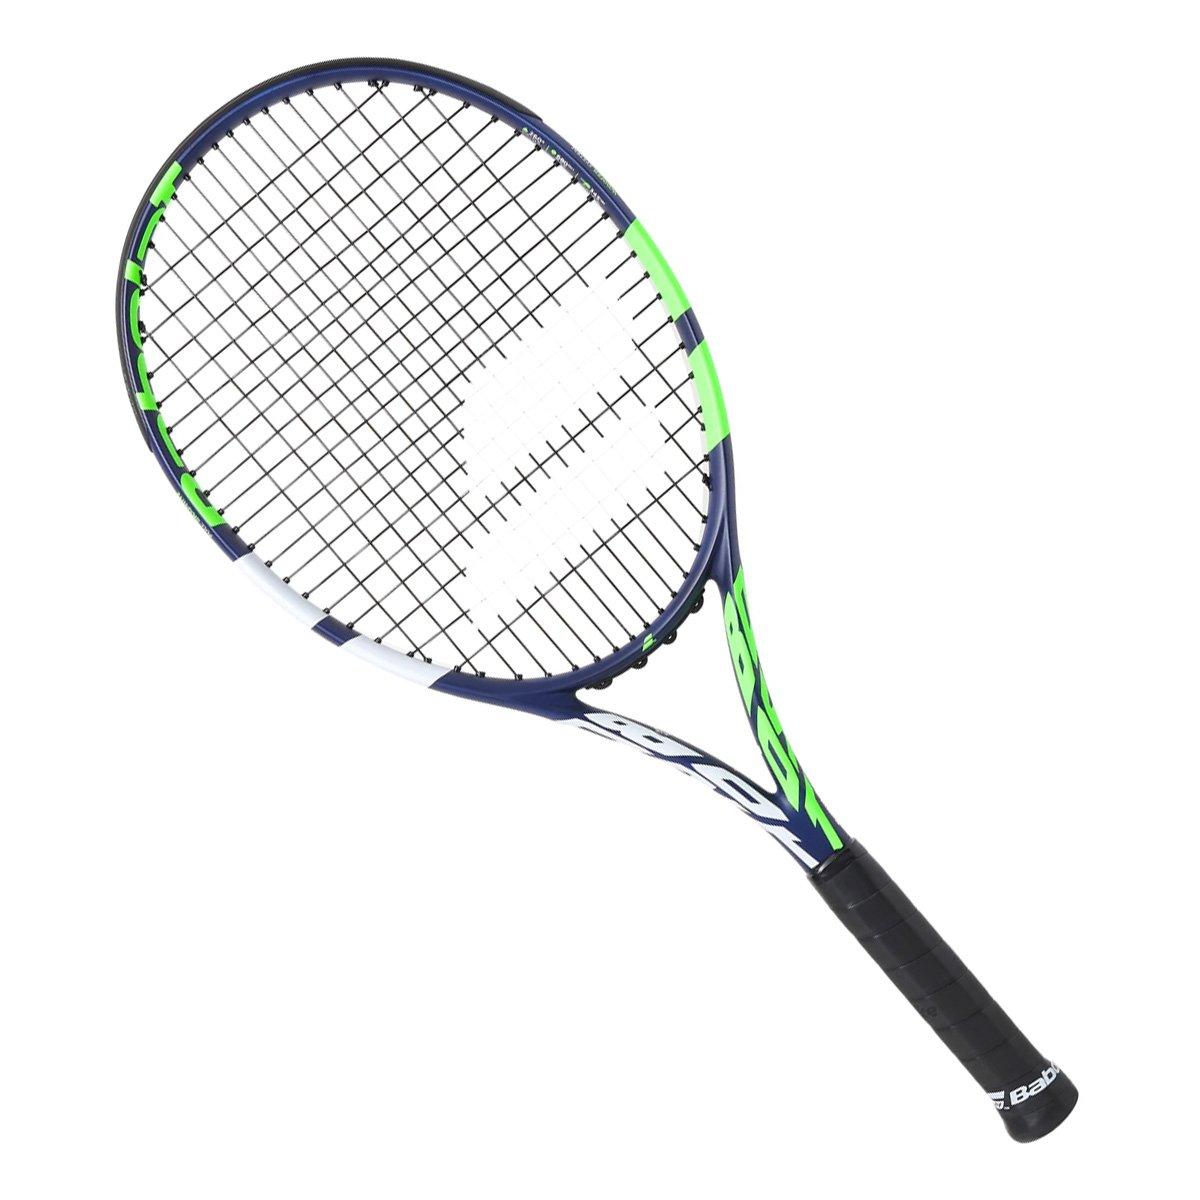 Raquete de Tênis Babolat Boost Drive 105 Azul Verde e Branco L1